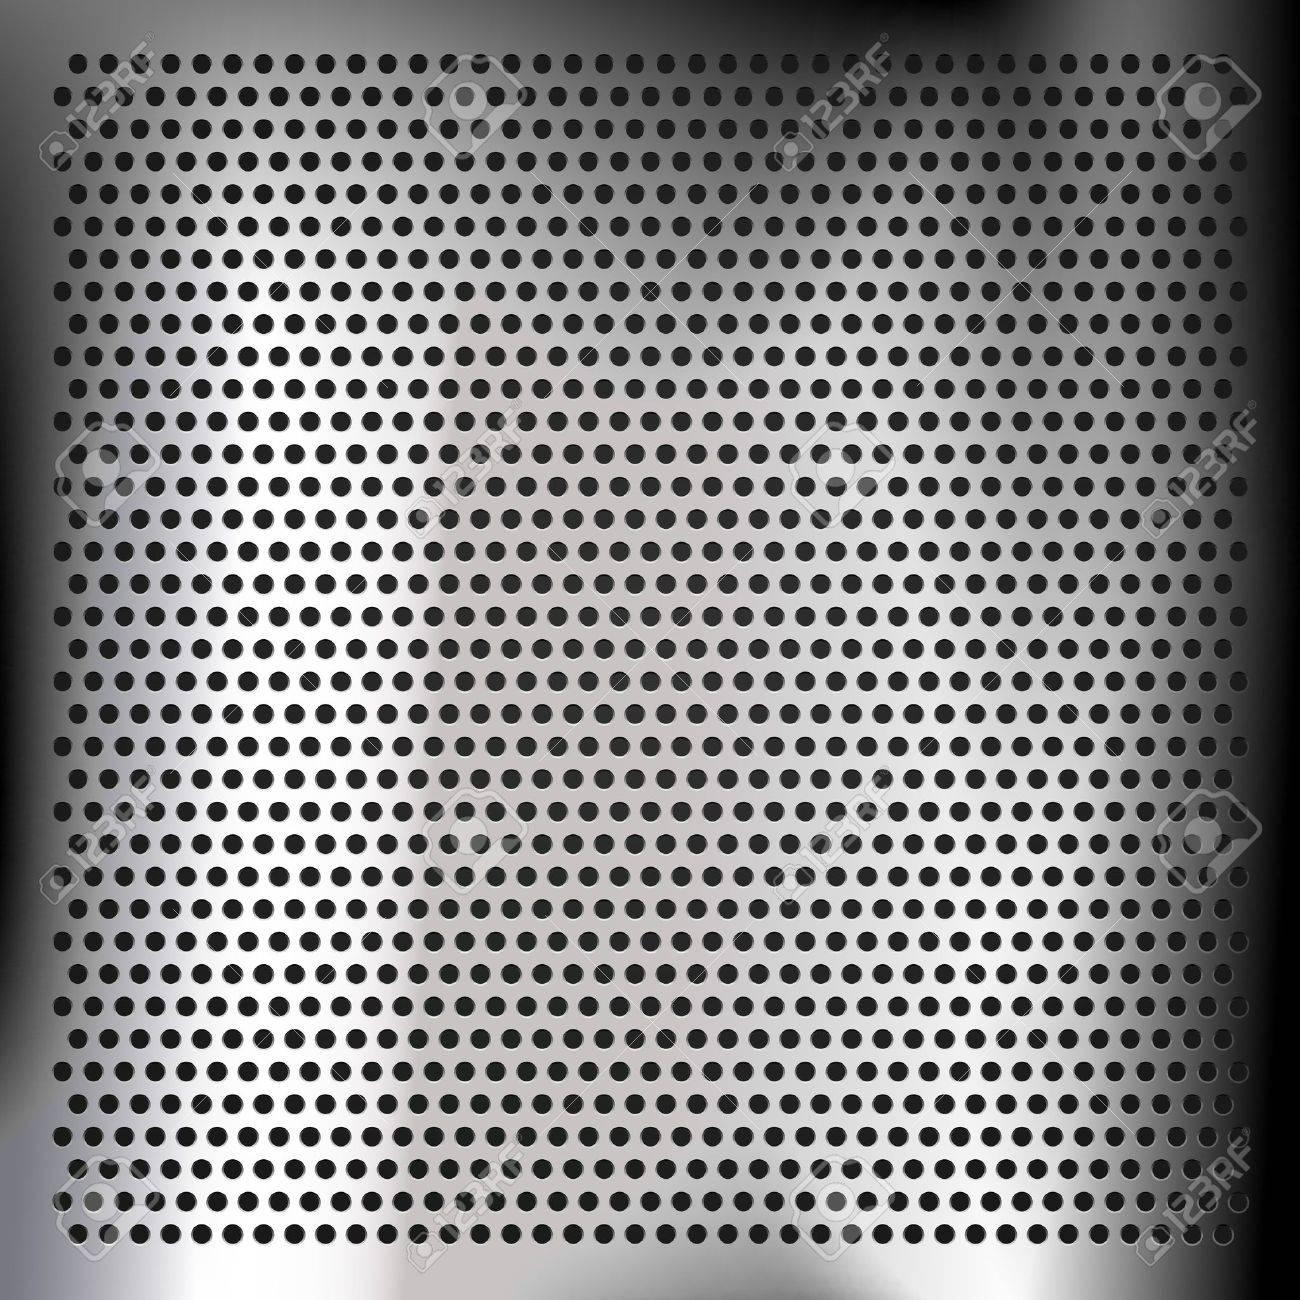 Chrome-plated sheet metal Stock Vector - 13630123